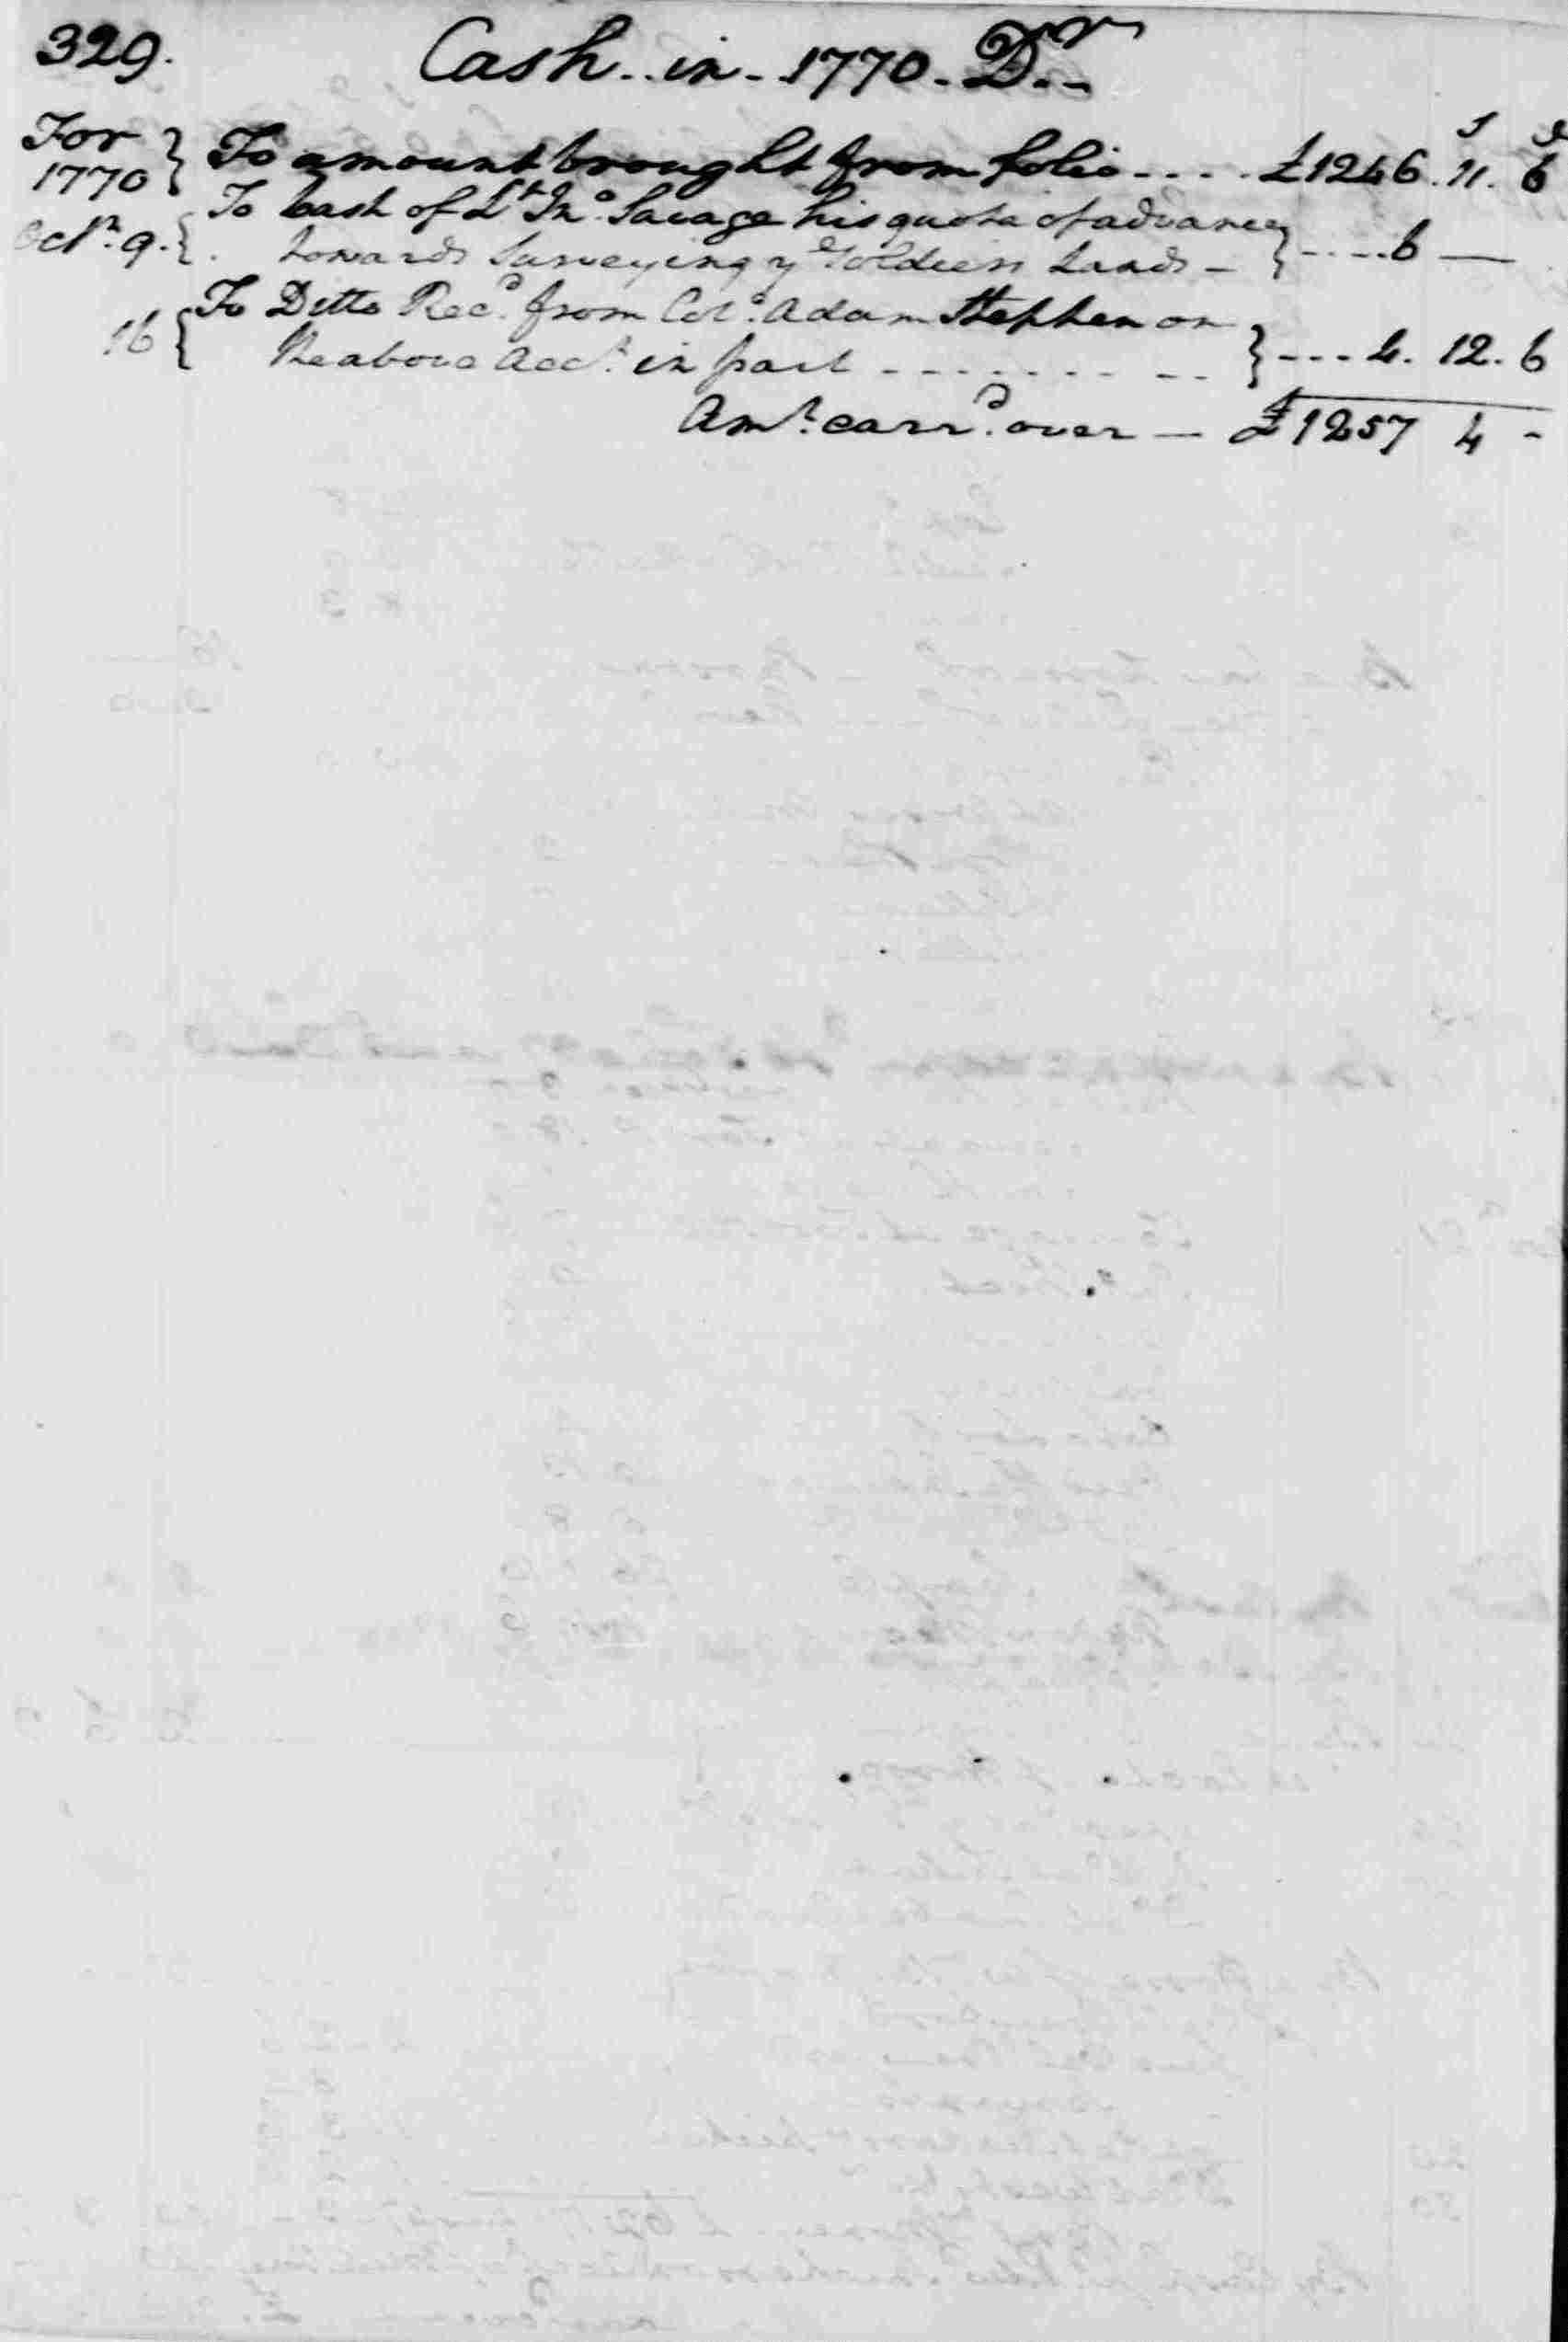 Ledger A, folio 329, left side